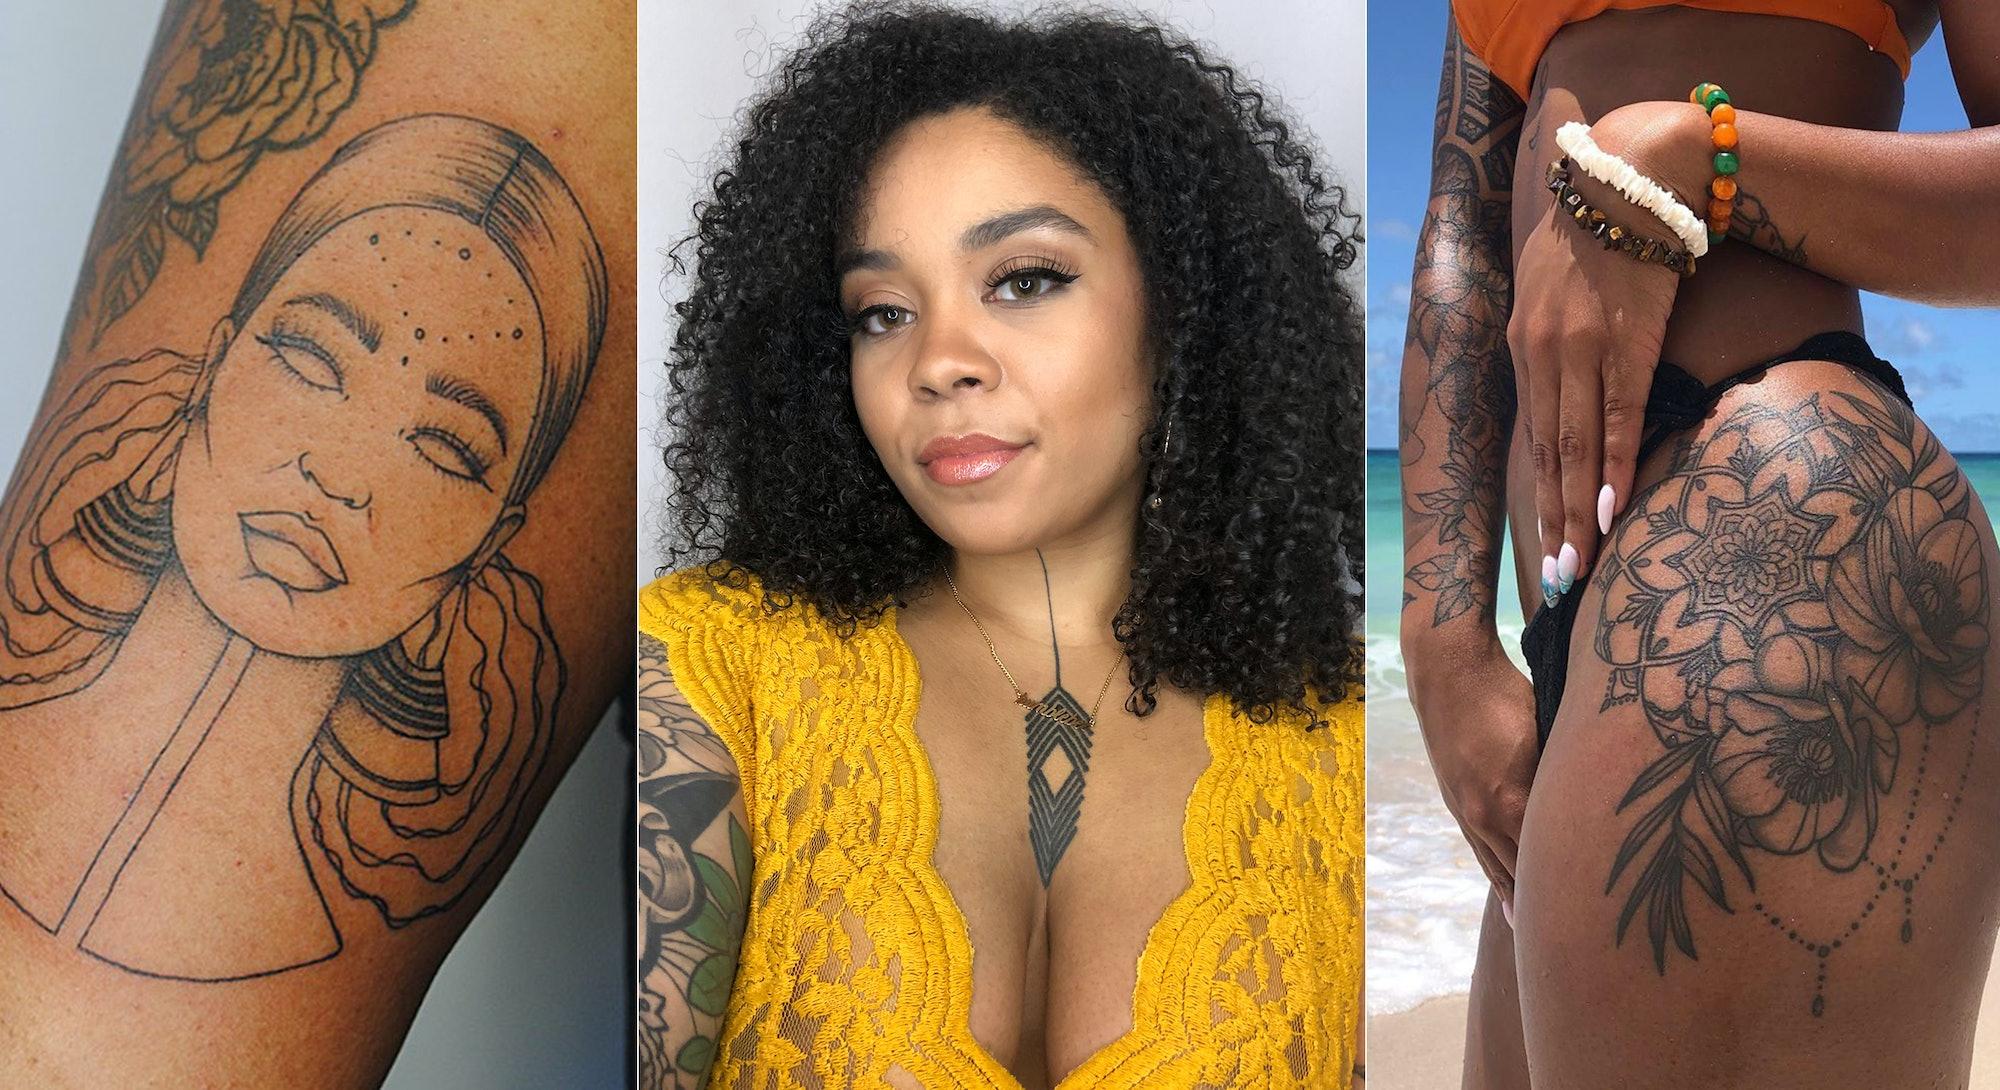 Toronto based tattoo artist Brittany Randell aka @humblebeetattoo.